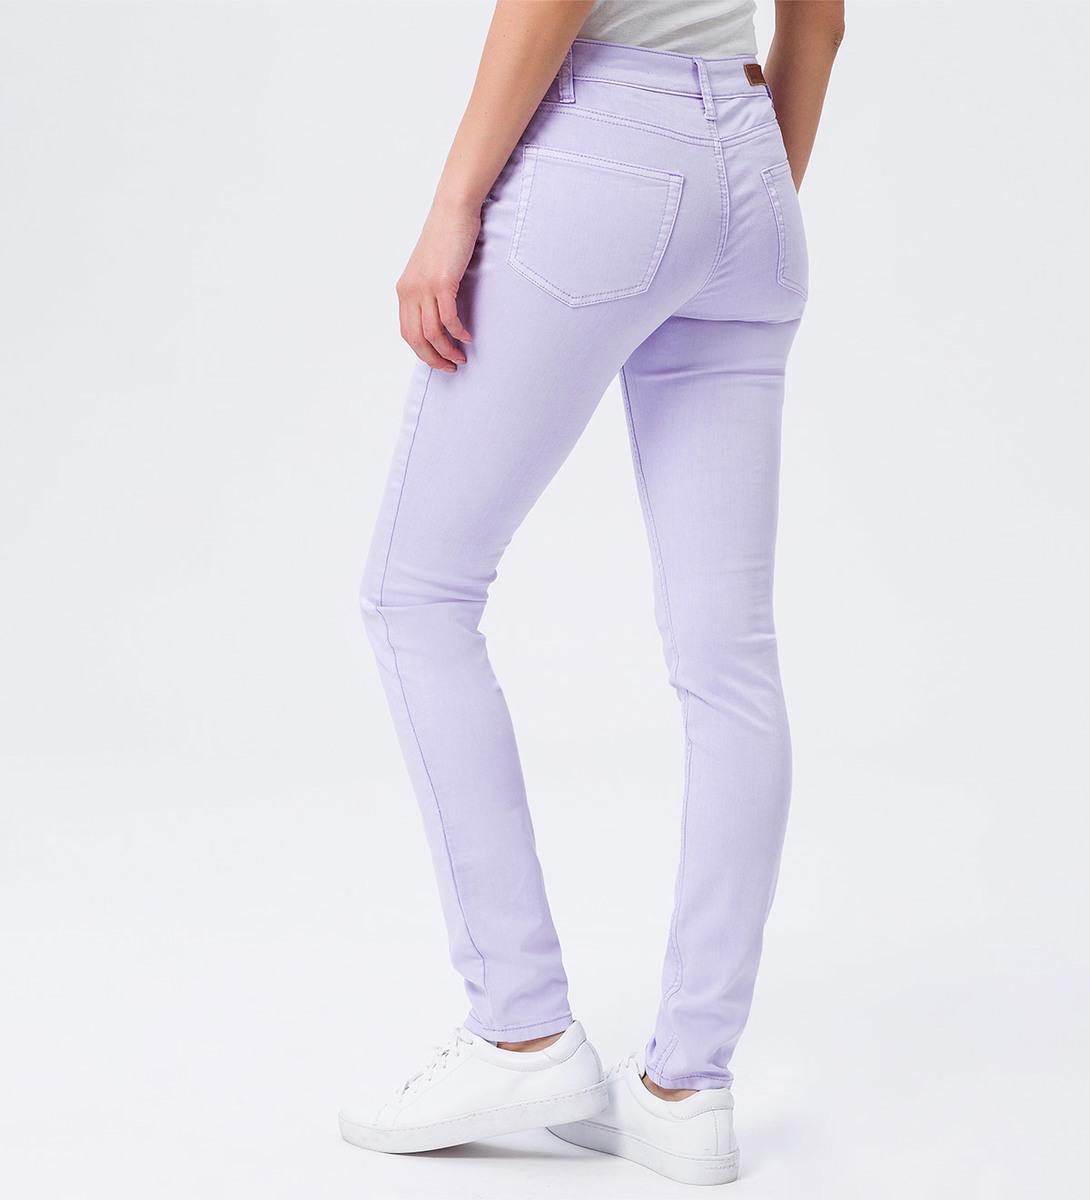 Jeans im Five-Pocket-Style in lavender